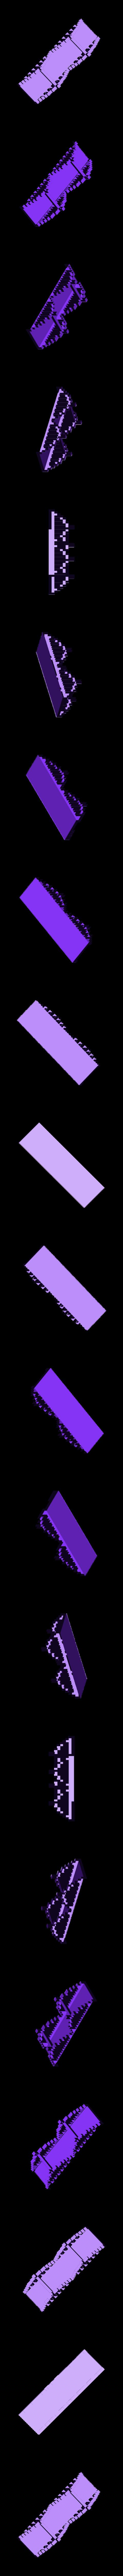 3DVnPovOLPV_1.stl Download free STL file Bridge • Design to 3D print, 3DPrintingGurus